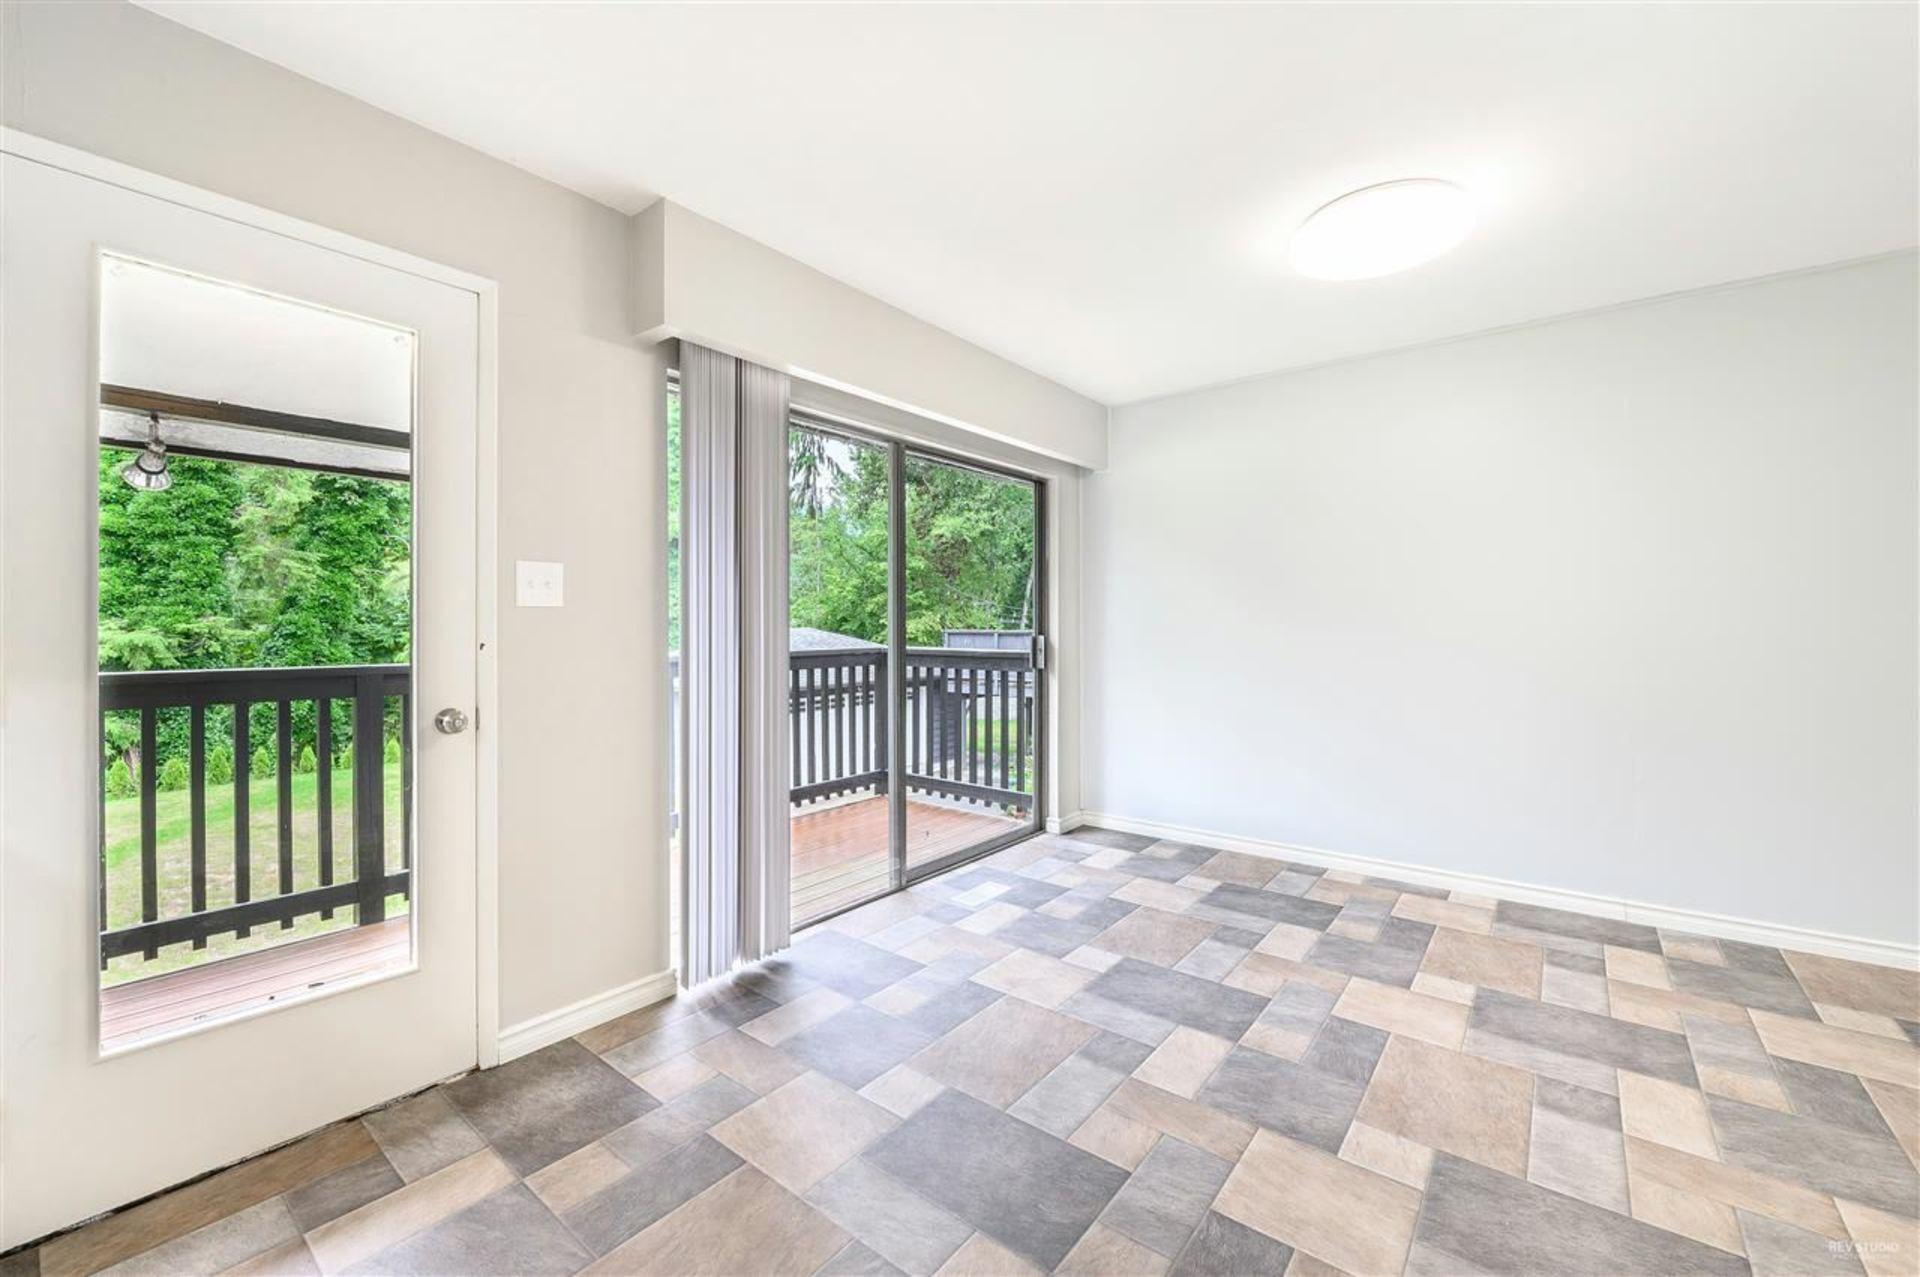 2841-noel-drive-sullivan-heights-burnaby-north-06 at 2841 Noel Drive, Sullivan Heights, Burnaby North